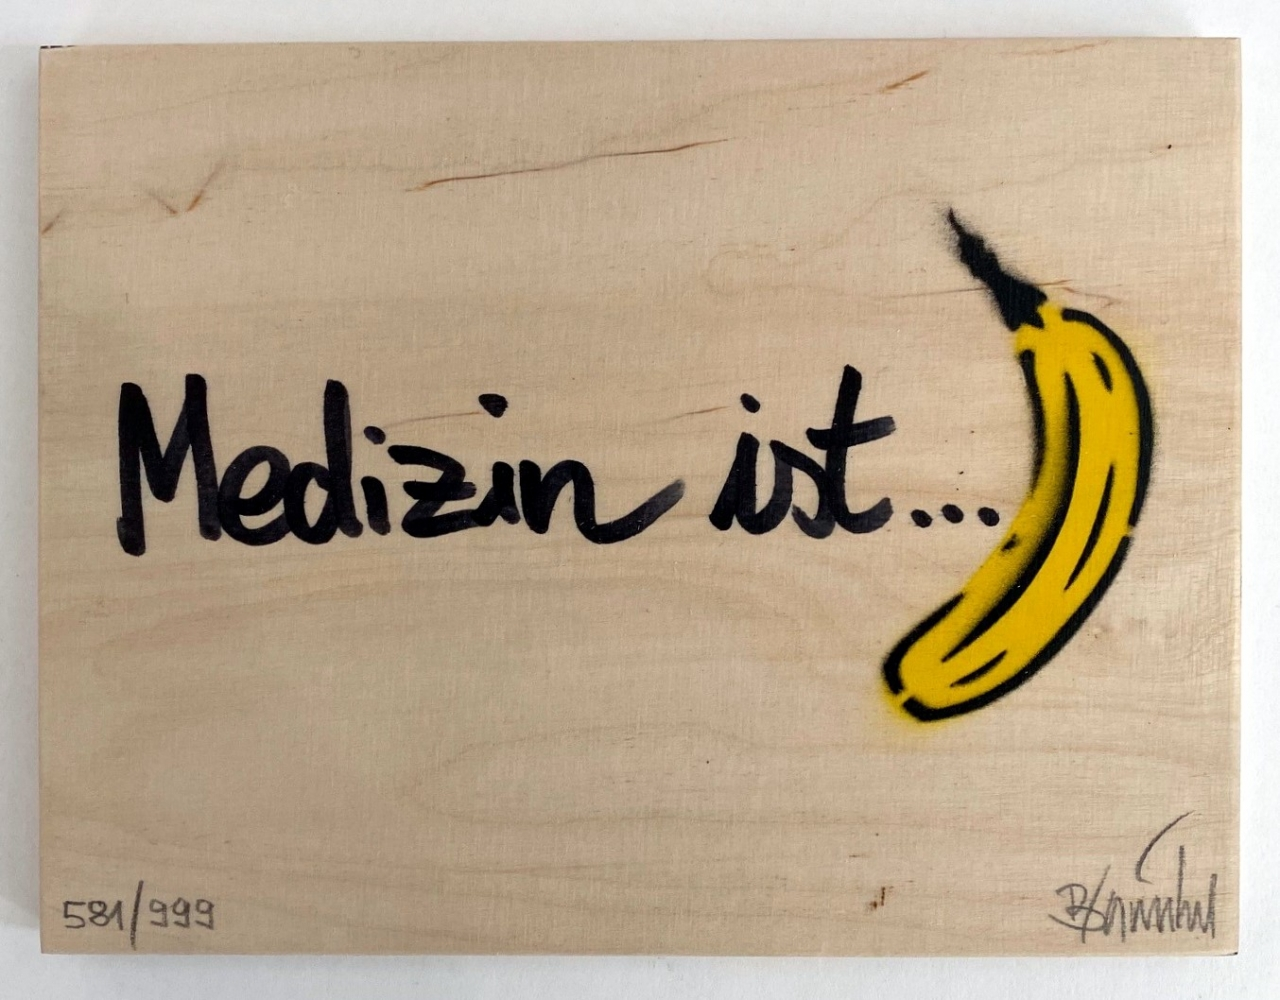 Medizin ist Banane